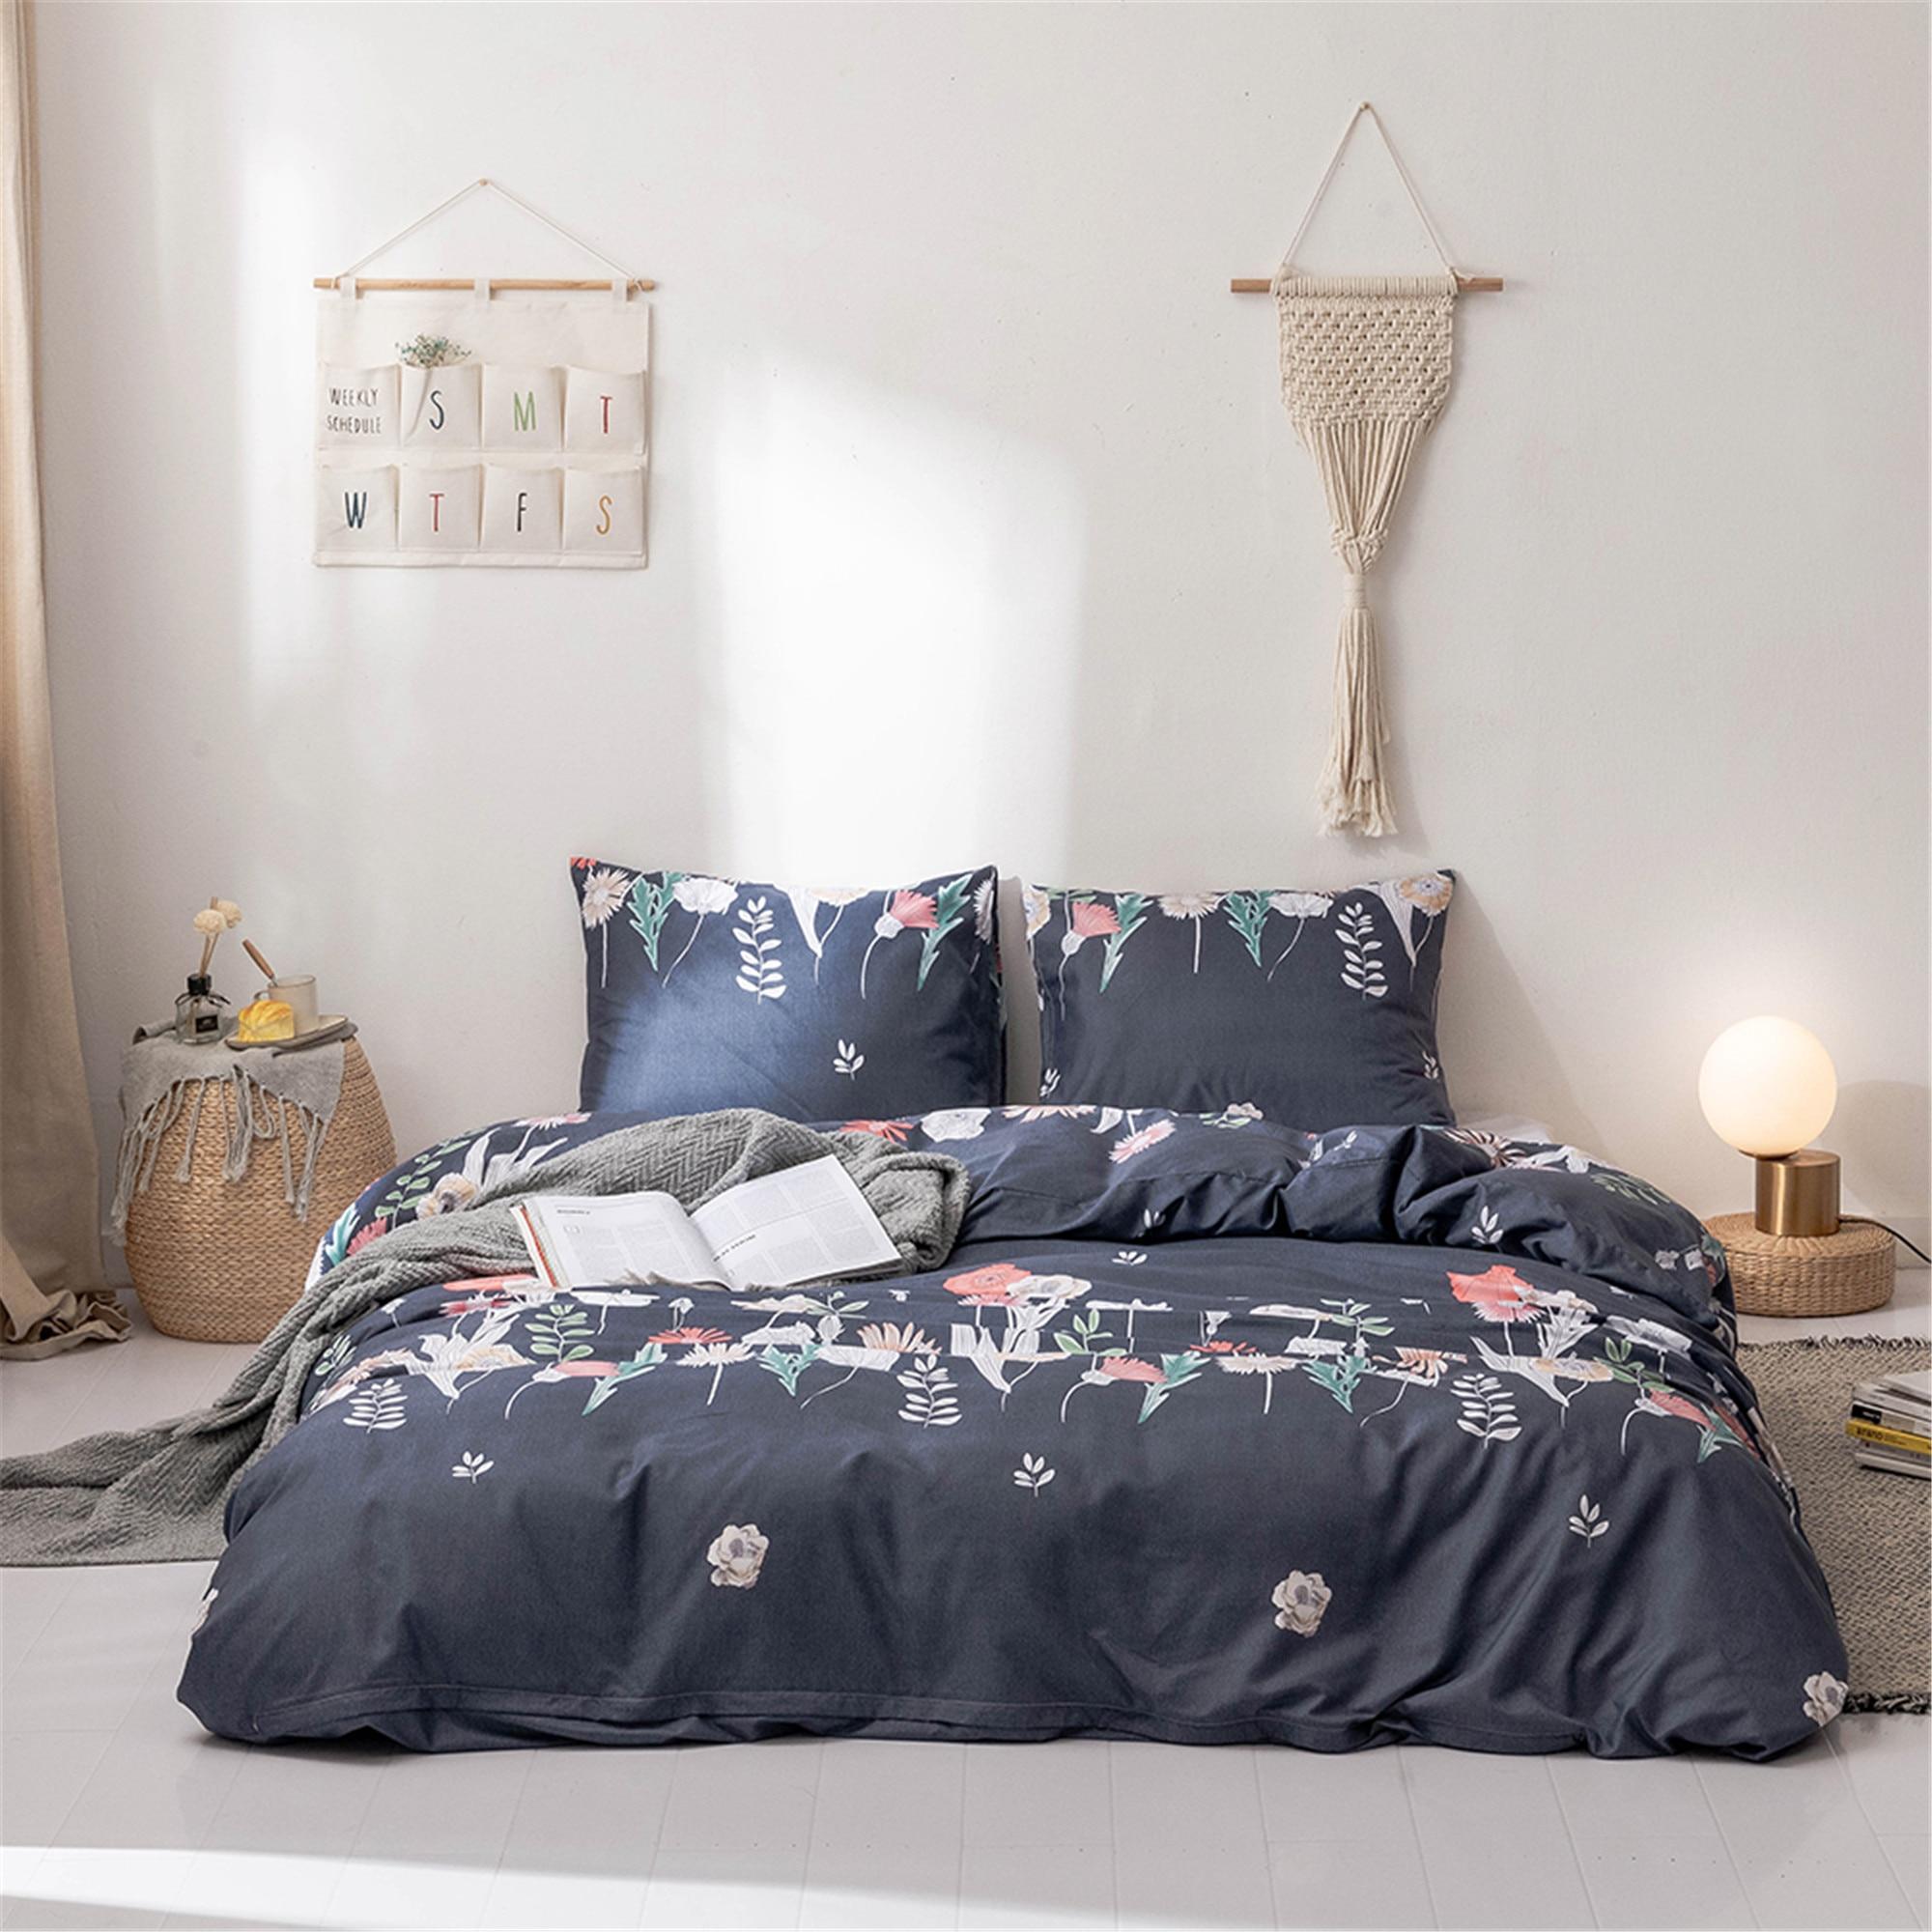 Beding Set Home Bedding Polyester 3 Piece Duvet Cover Quilt Sets Pillowcase King Queen Twin Luxurious Soft